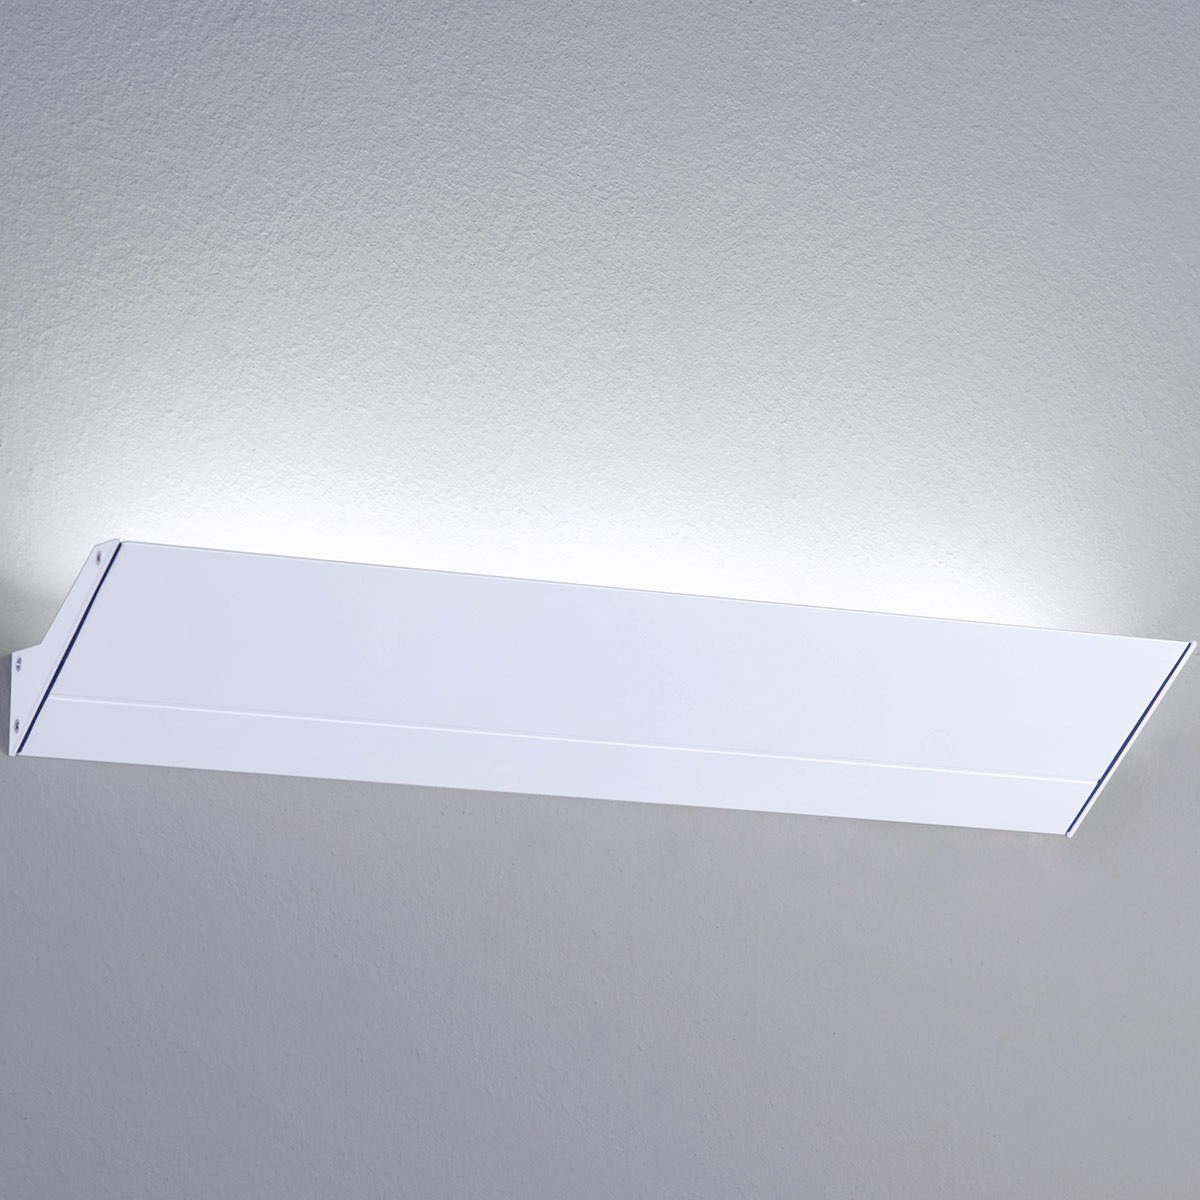 Milan Mini Neva Wandleuchte LED, 3-flg., weiß lackiert